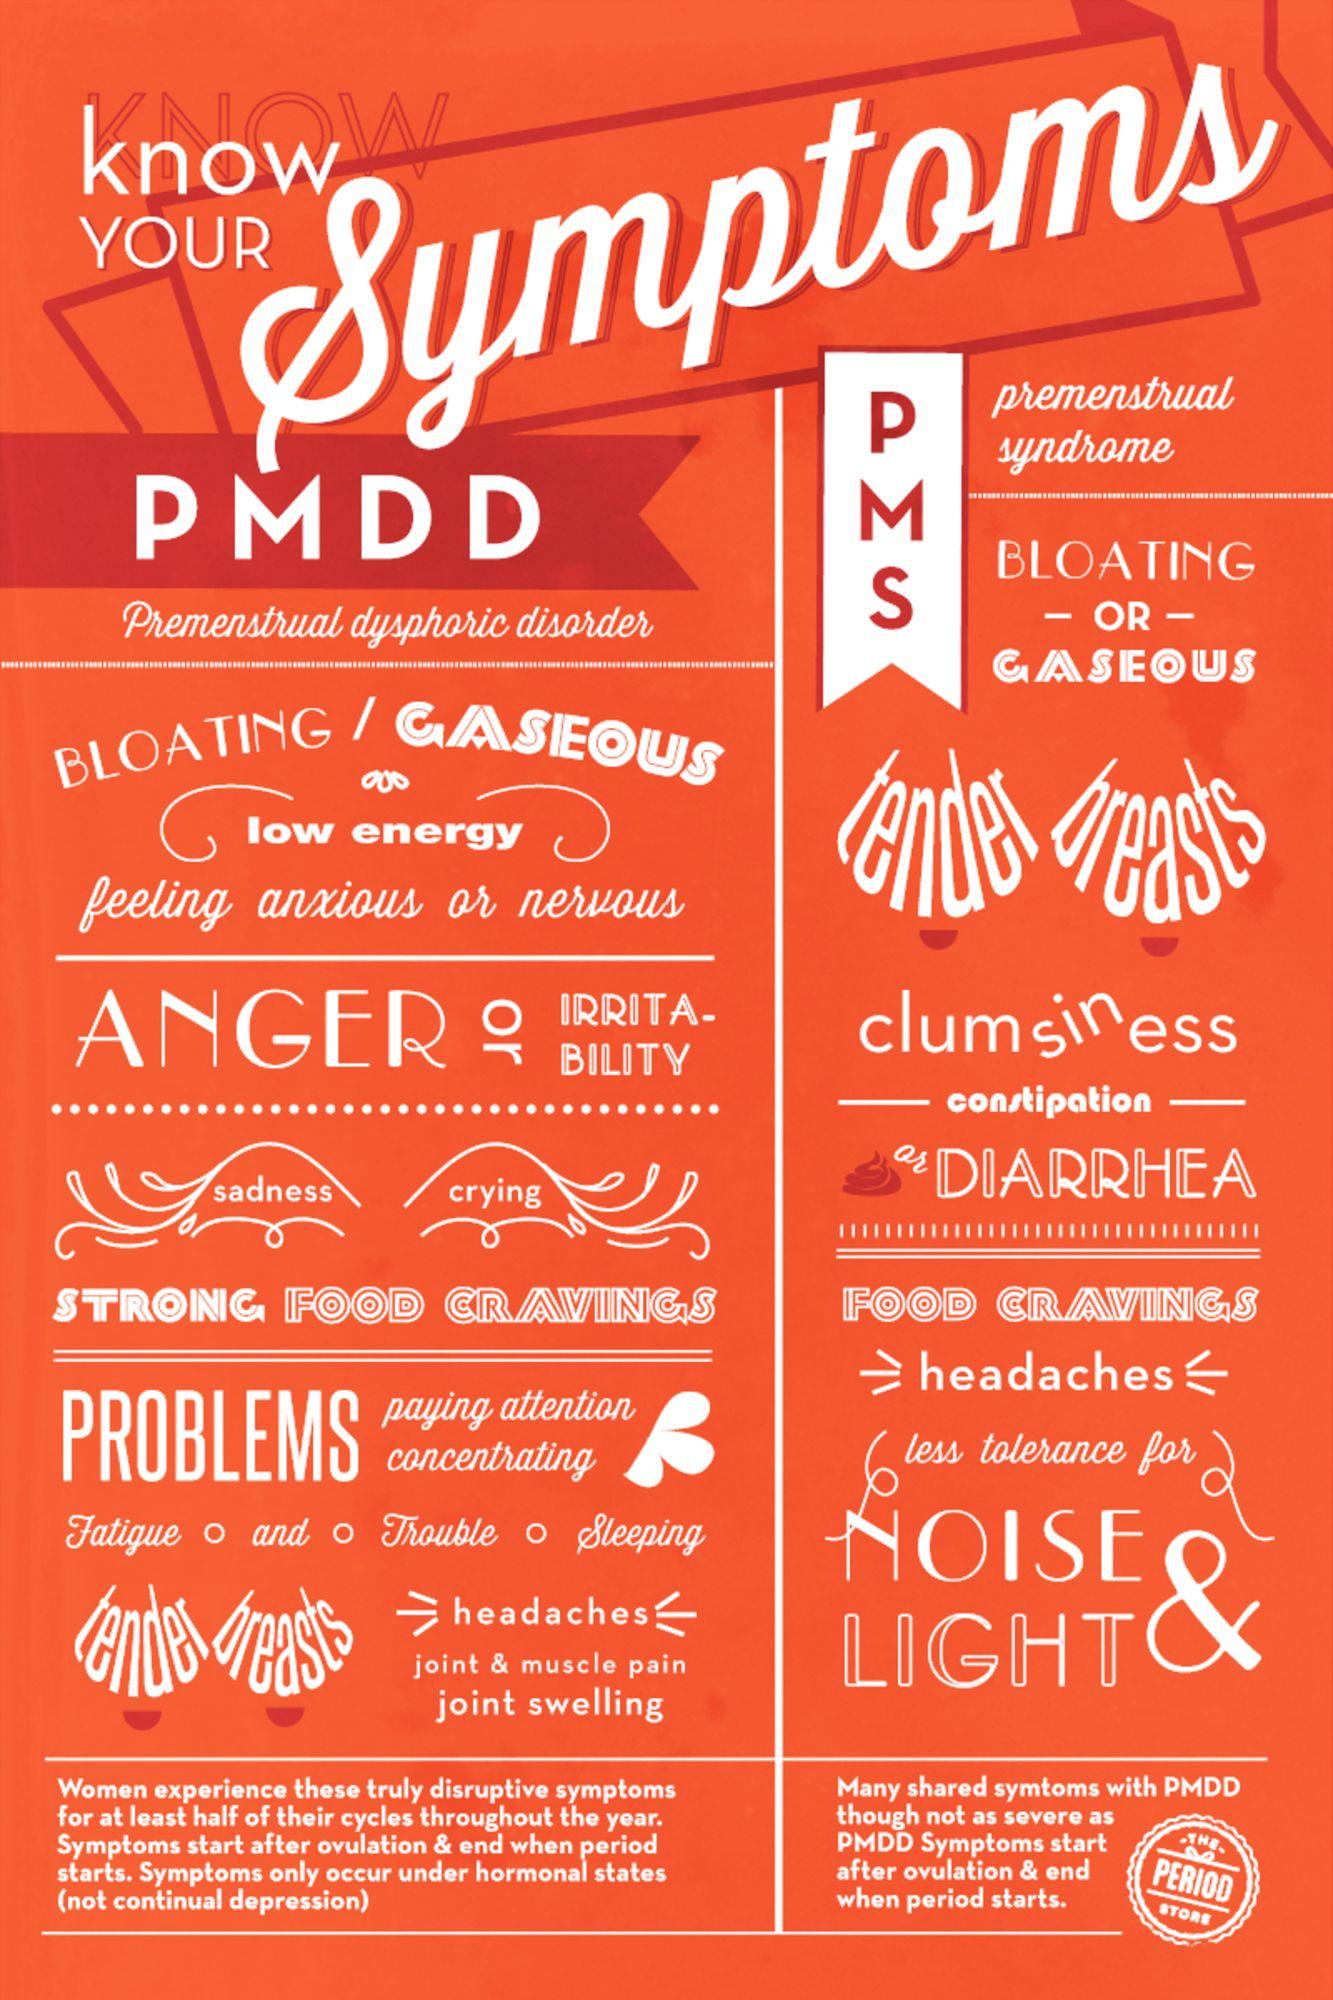 Terrible pms mood swings